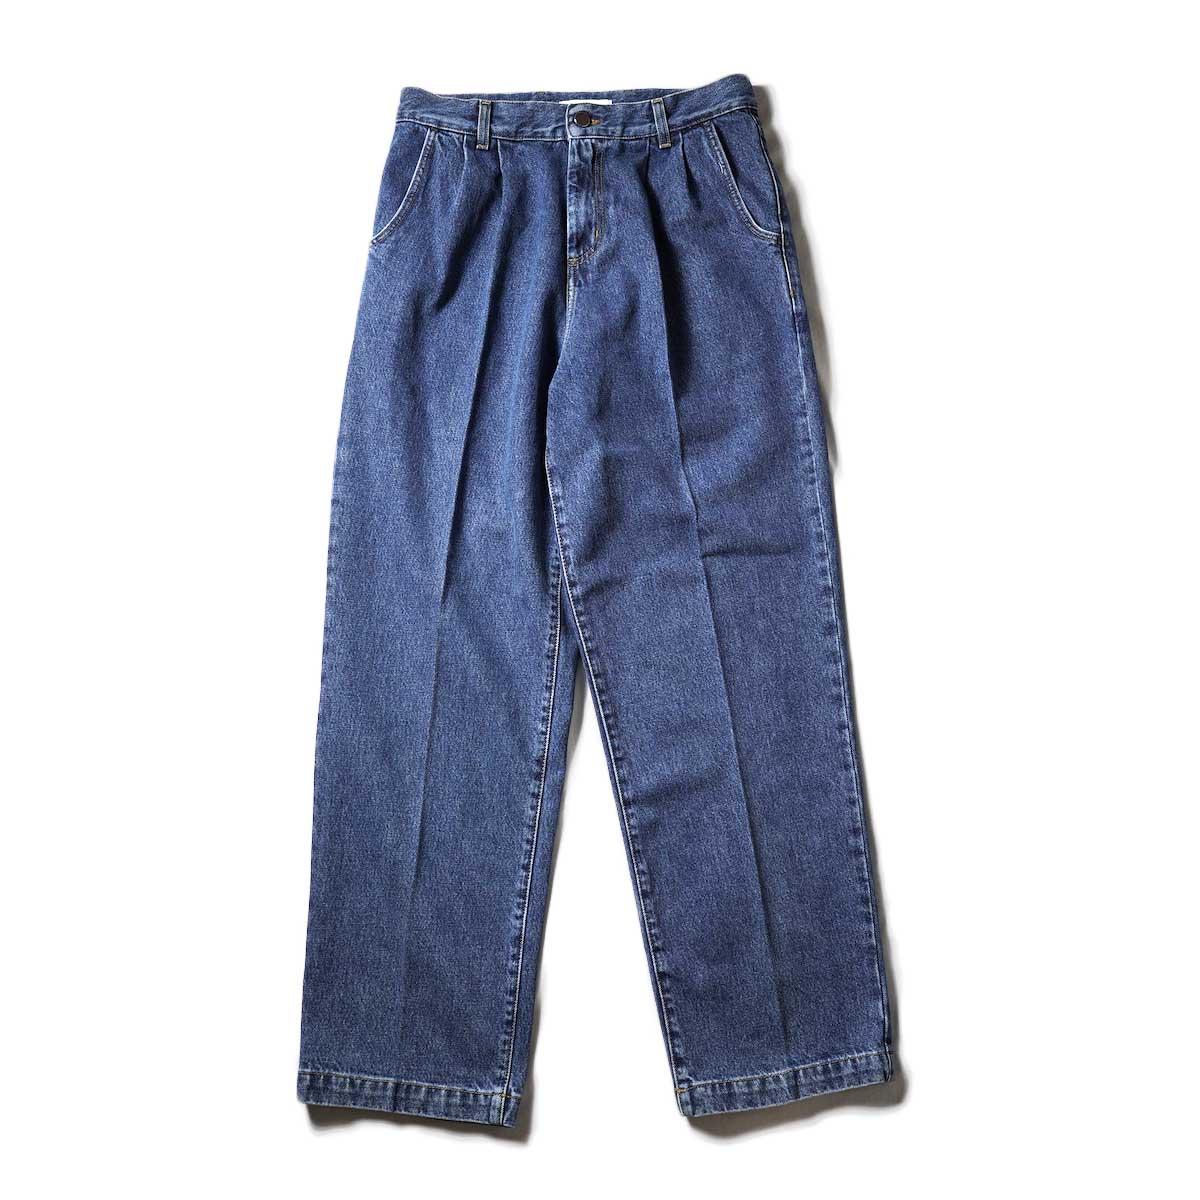 mfpen /BIG JEANS (Blue)正面